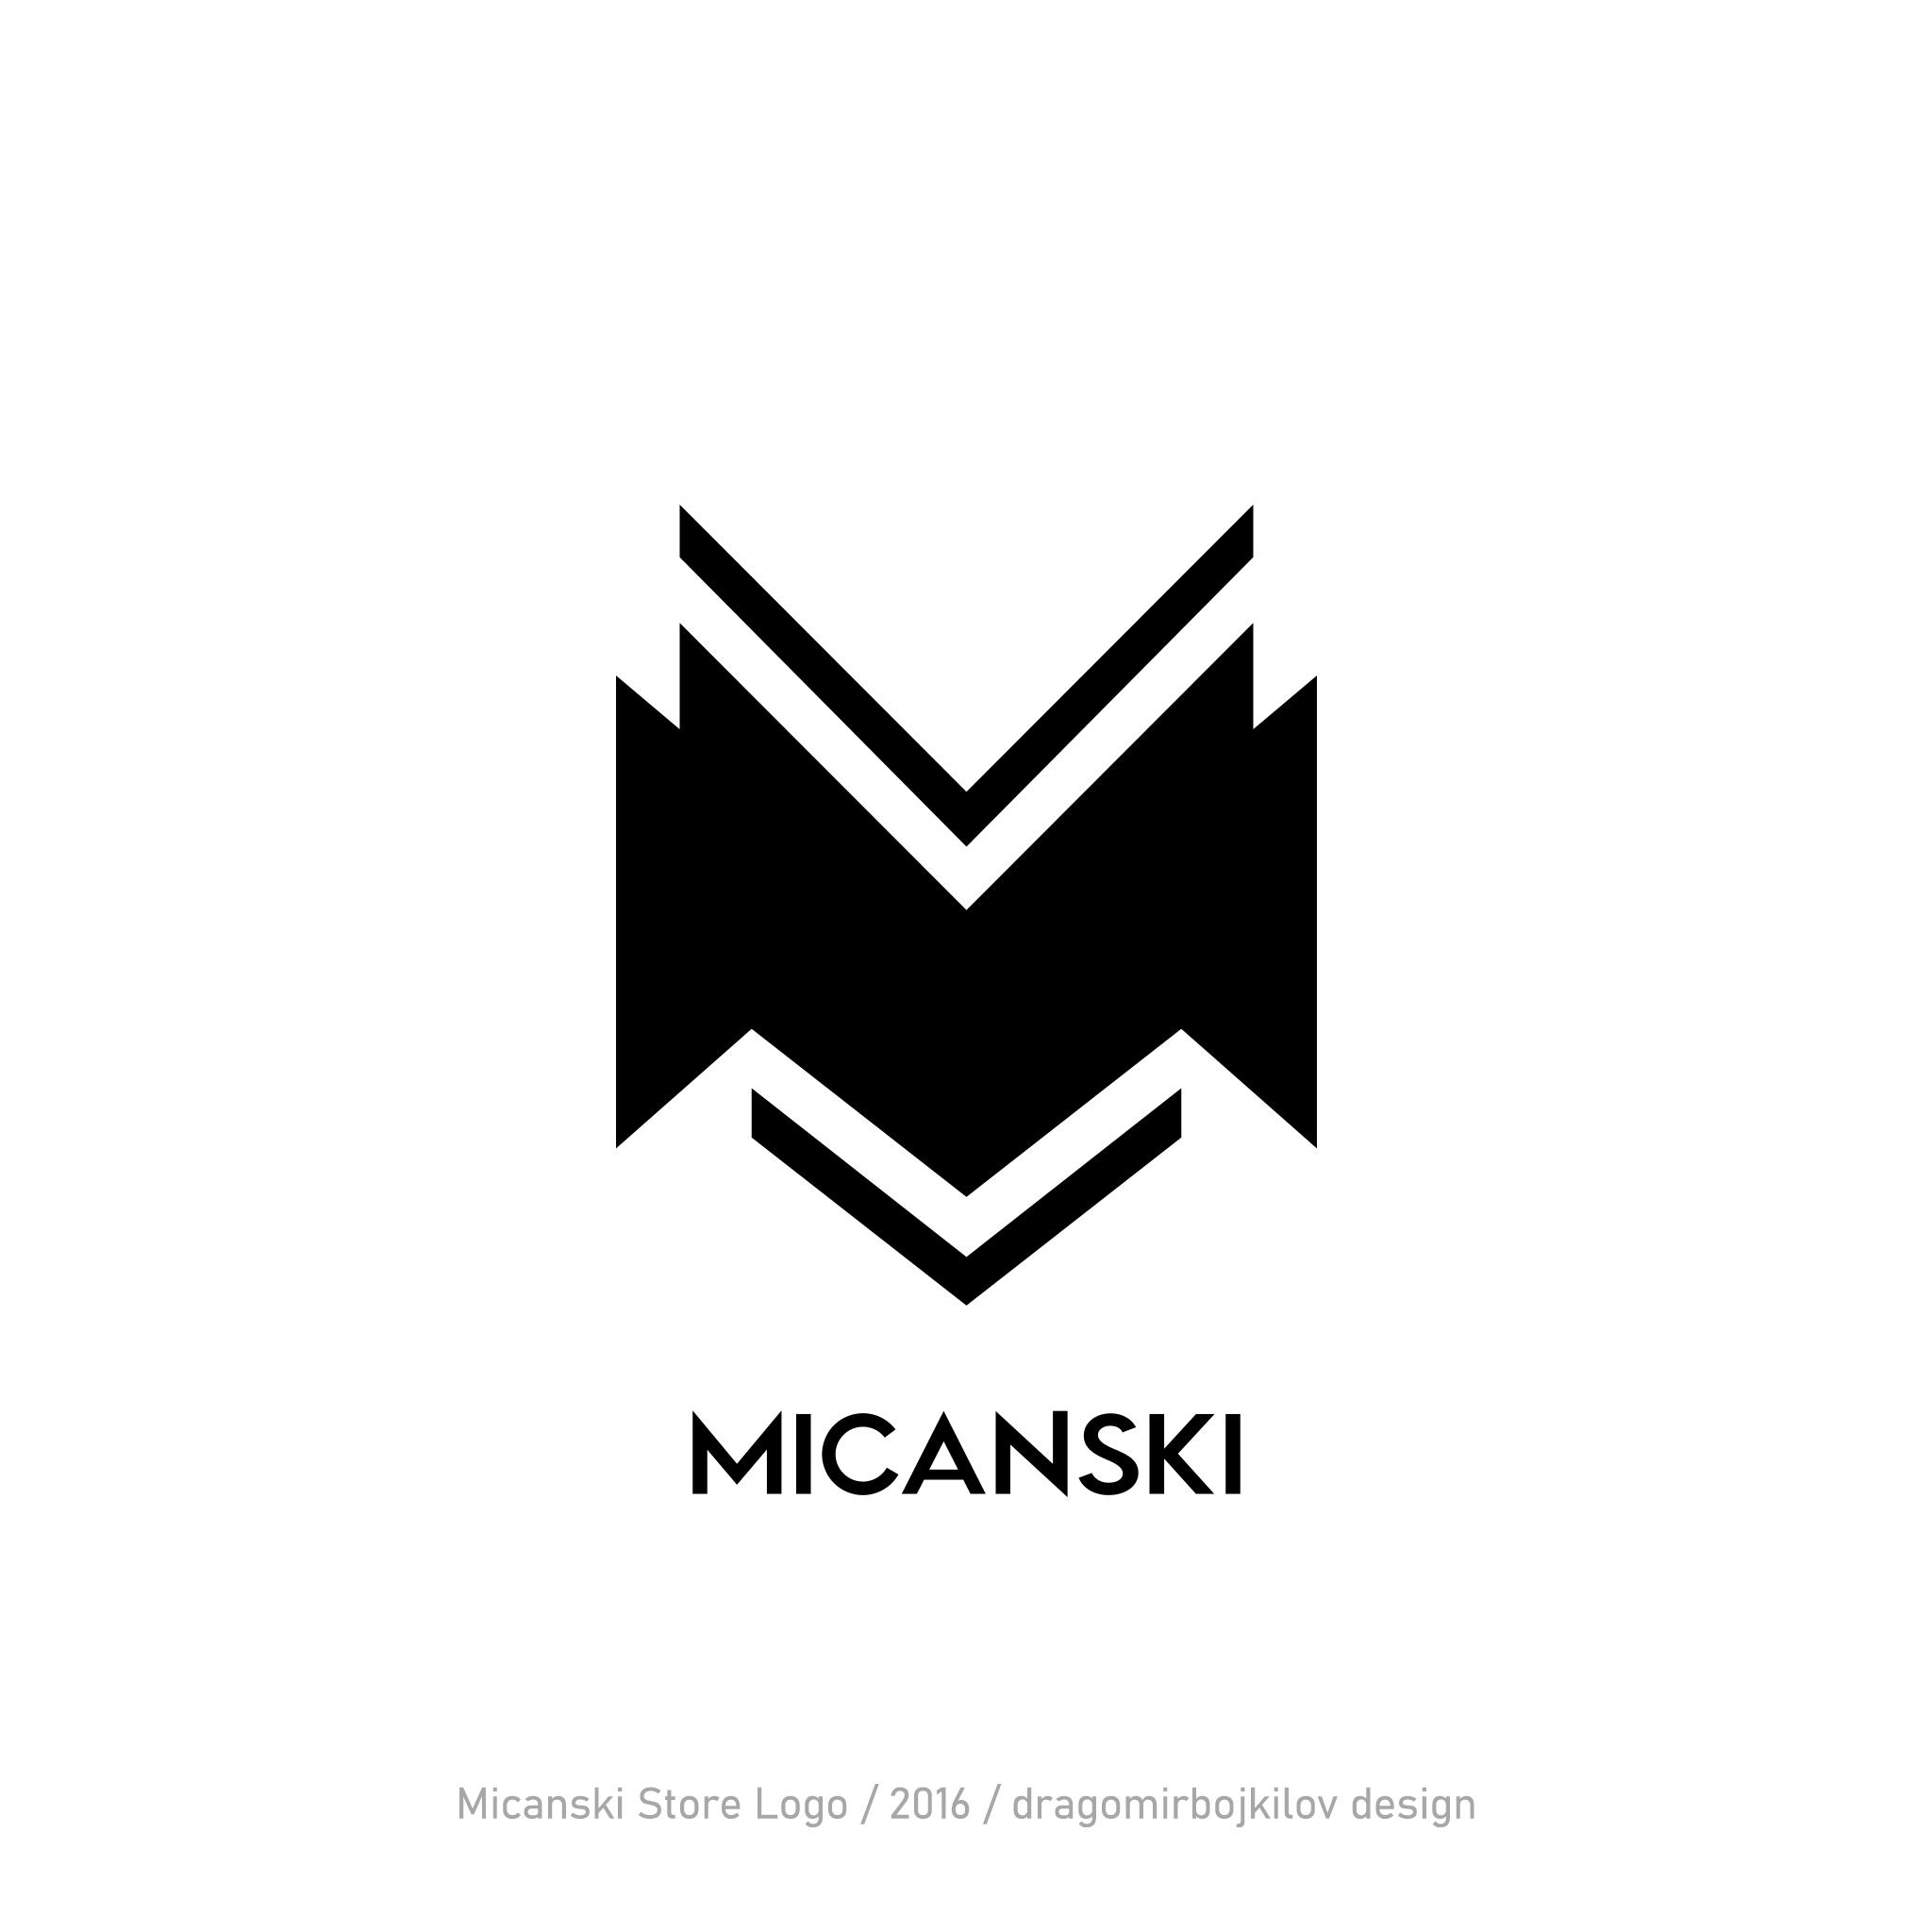 MICANSKI